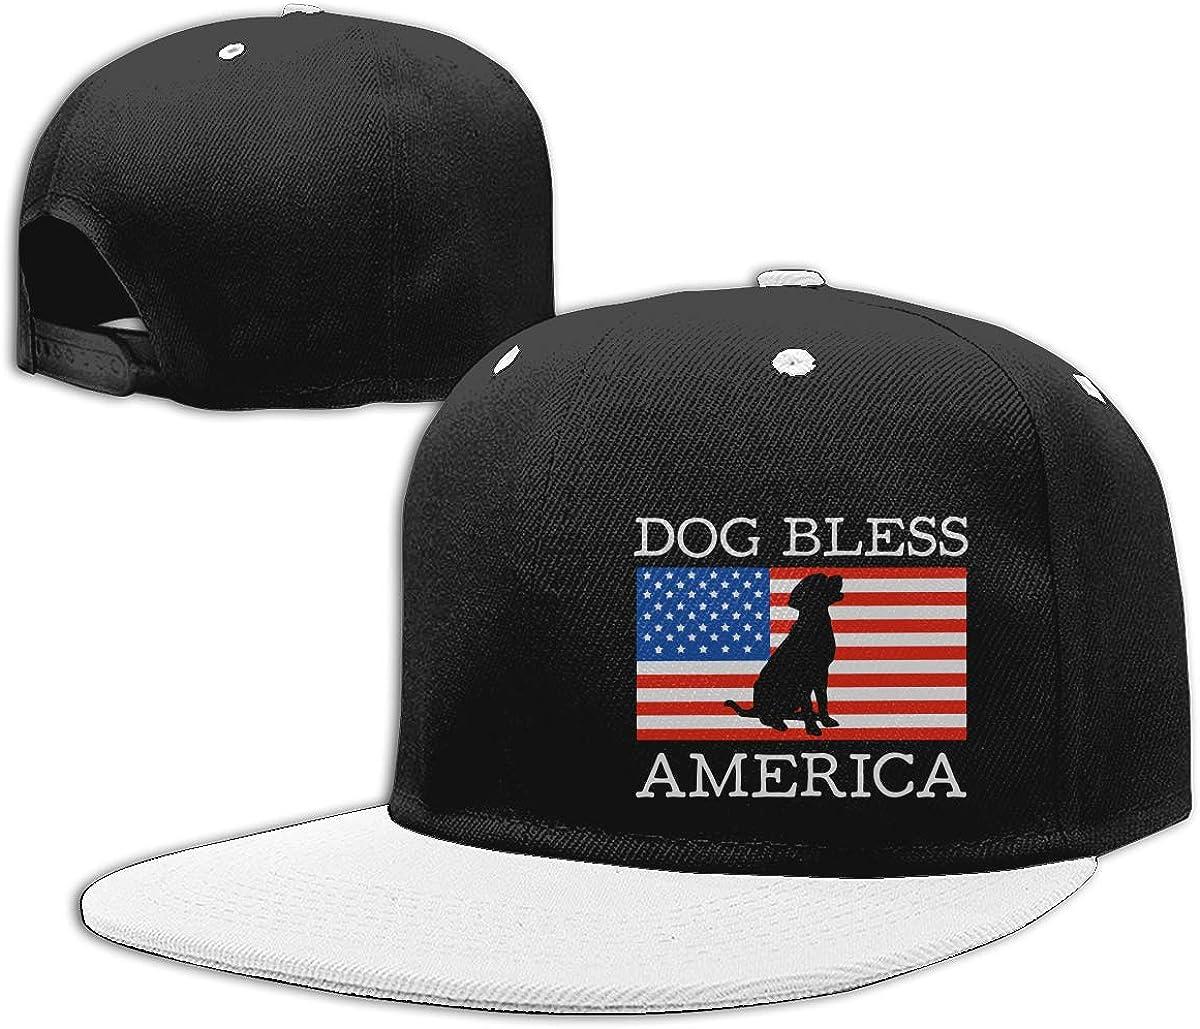 Women Men Punk Rock Cap Dog Bless America Classic Flat Peaked Baseball Caps